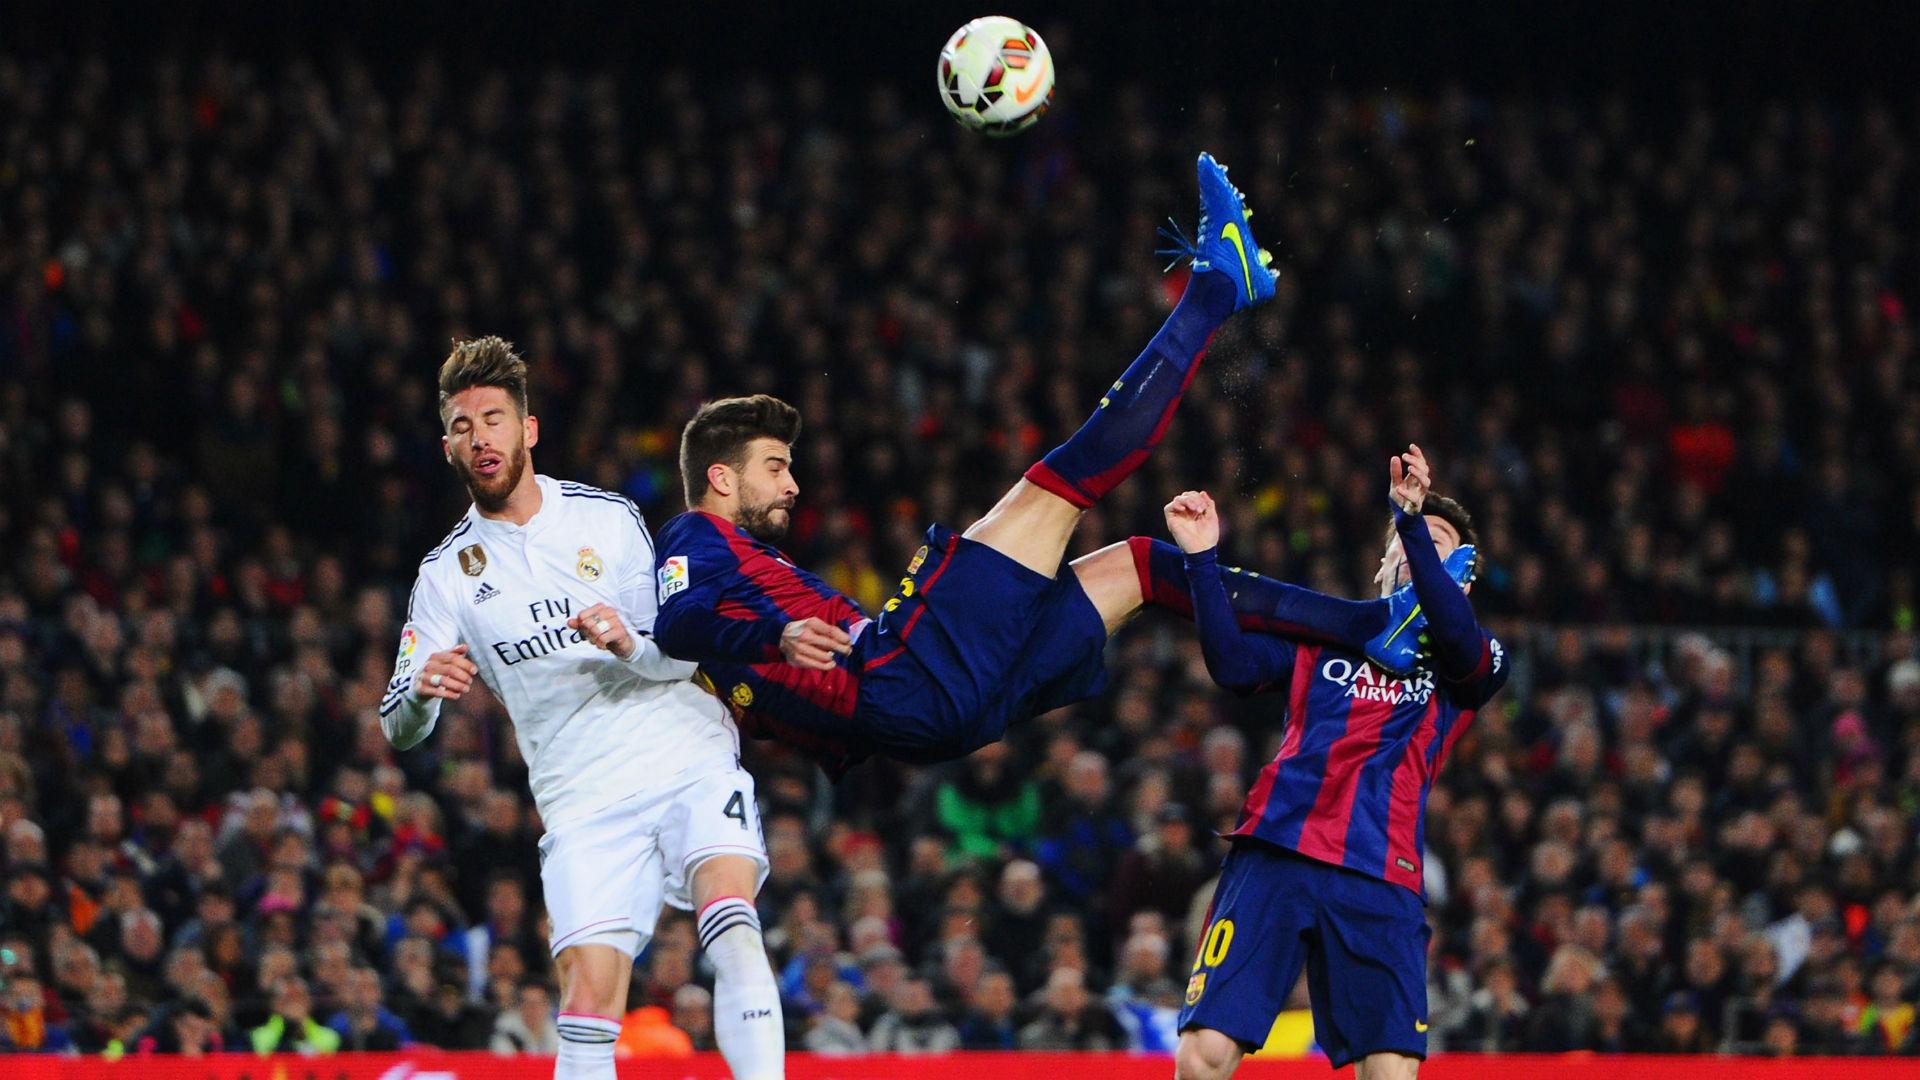 Real Madrid Desktop Wallpaper Hd Gerard Pique Wallpaper